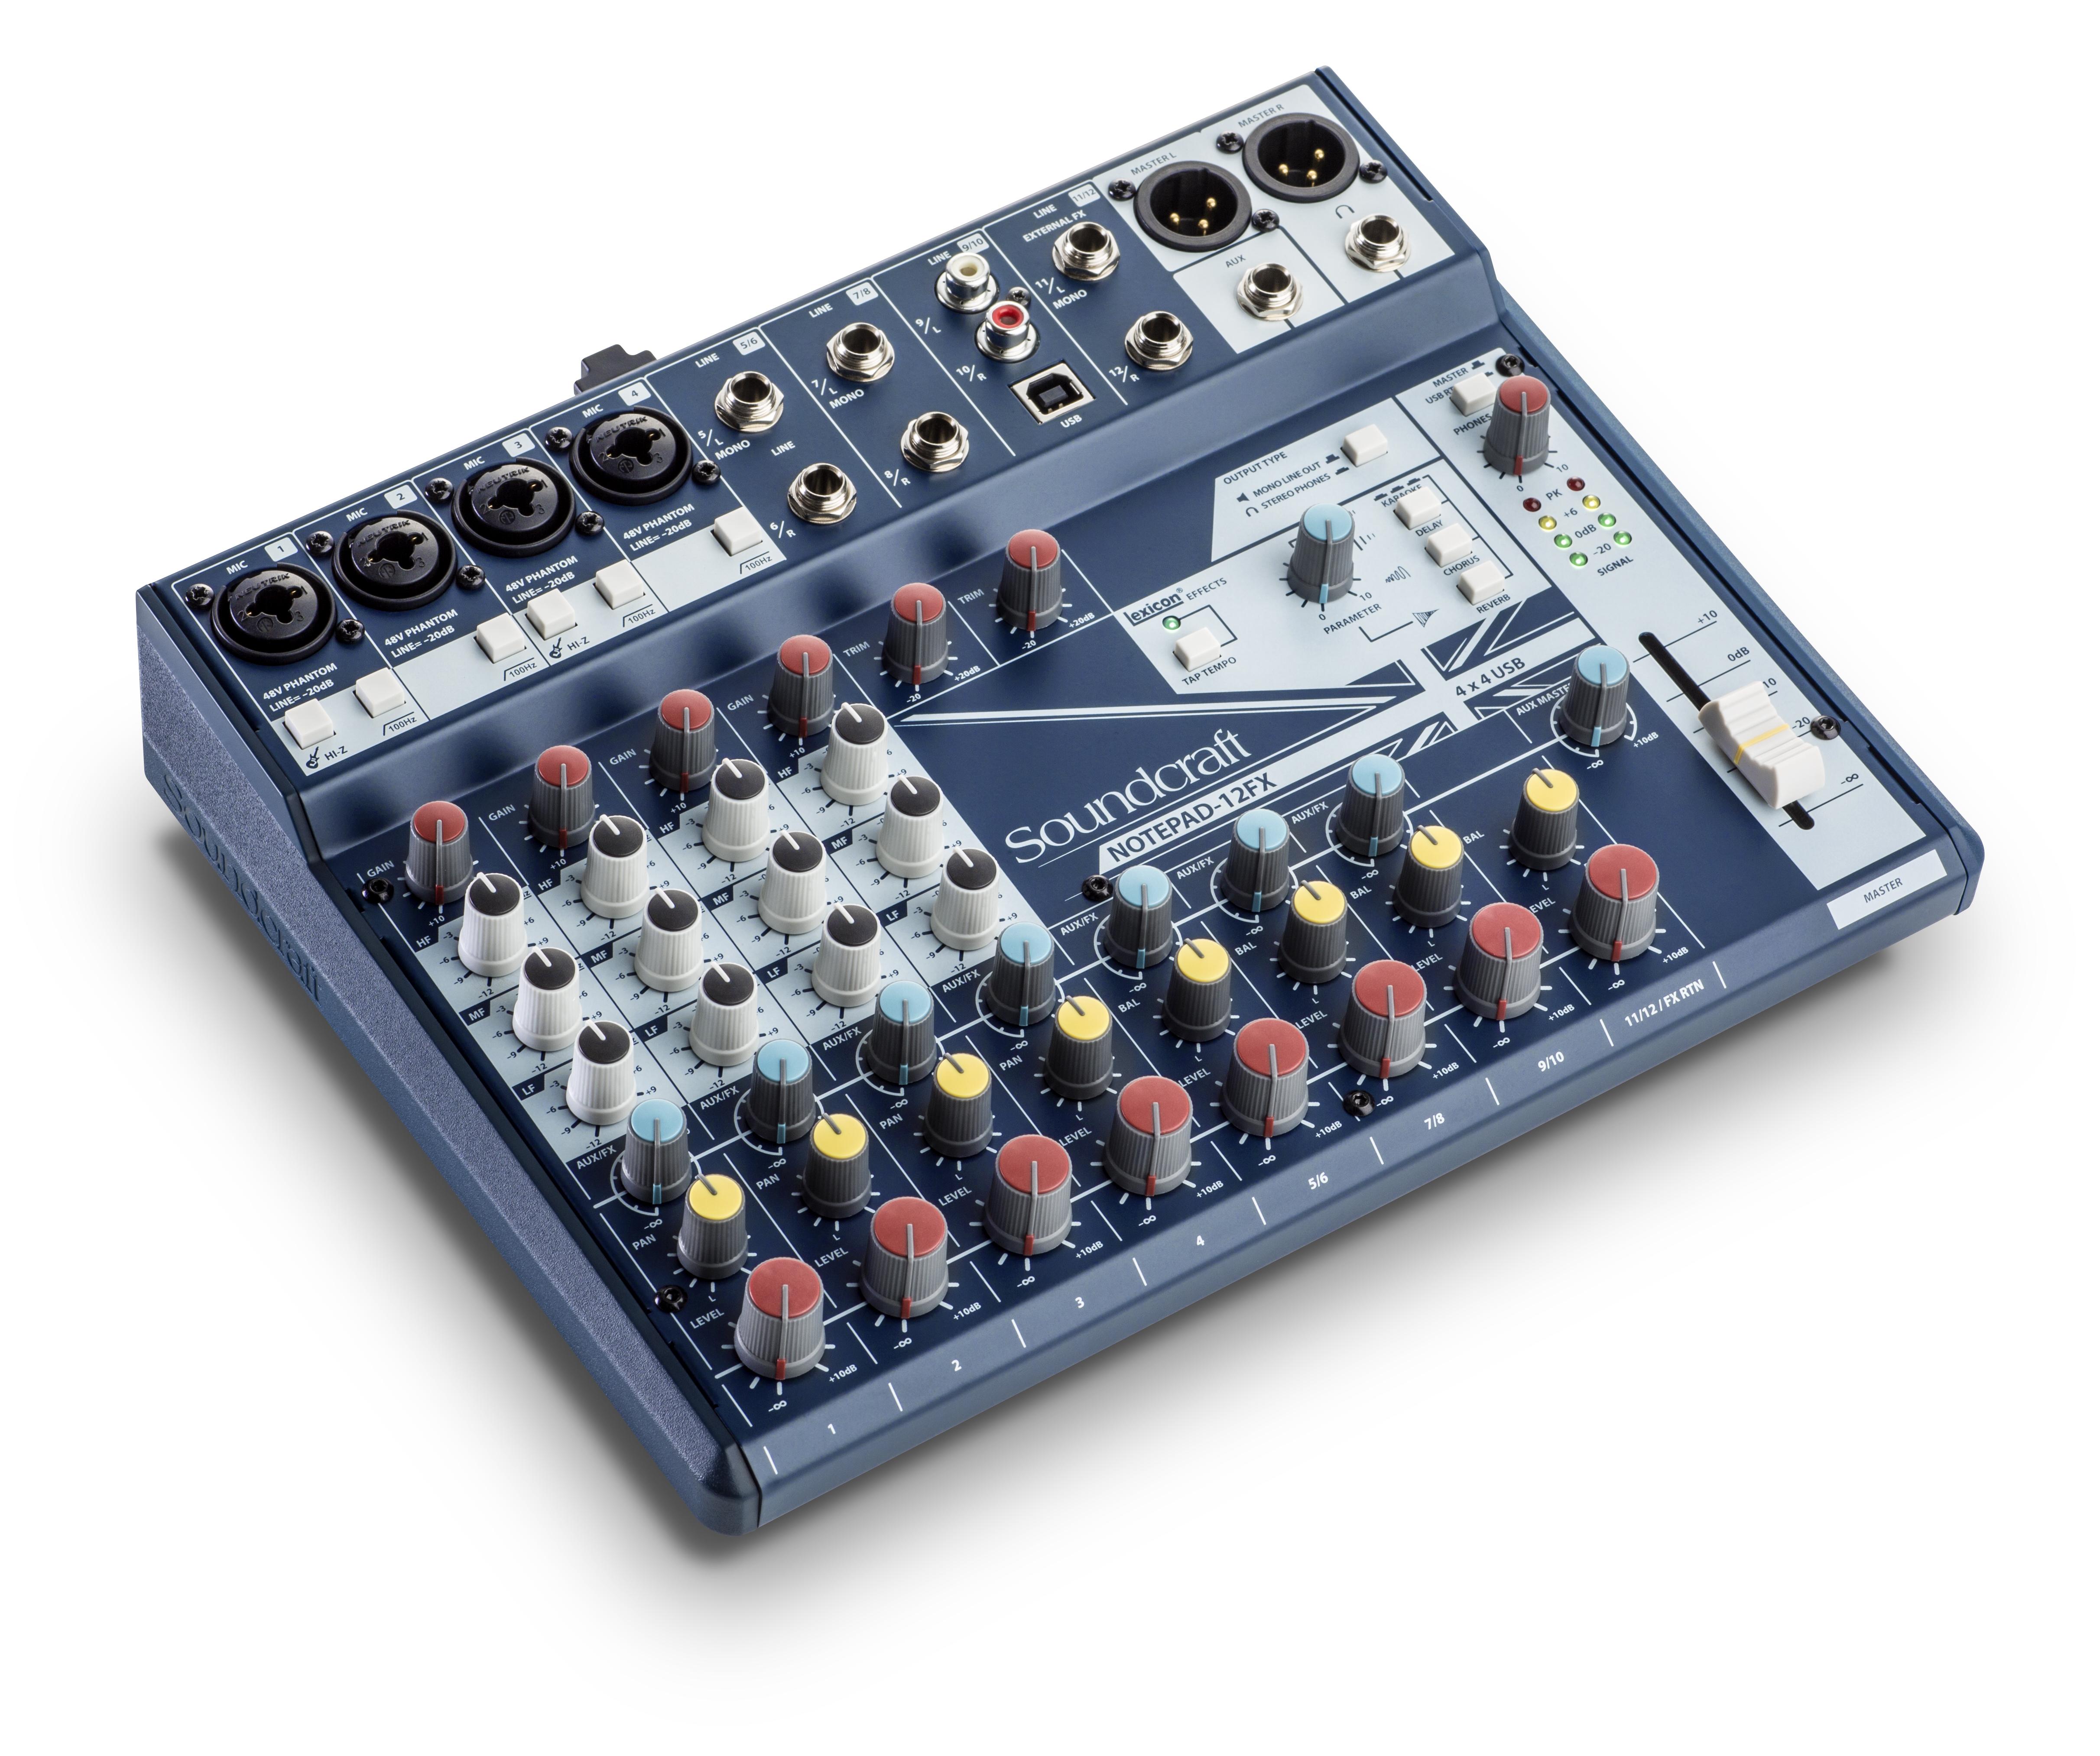 notepad 12fx soundcraft professional audio mixers. Black Bedroom Furniture Sets. Home Design Ideas